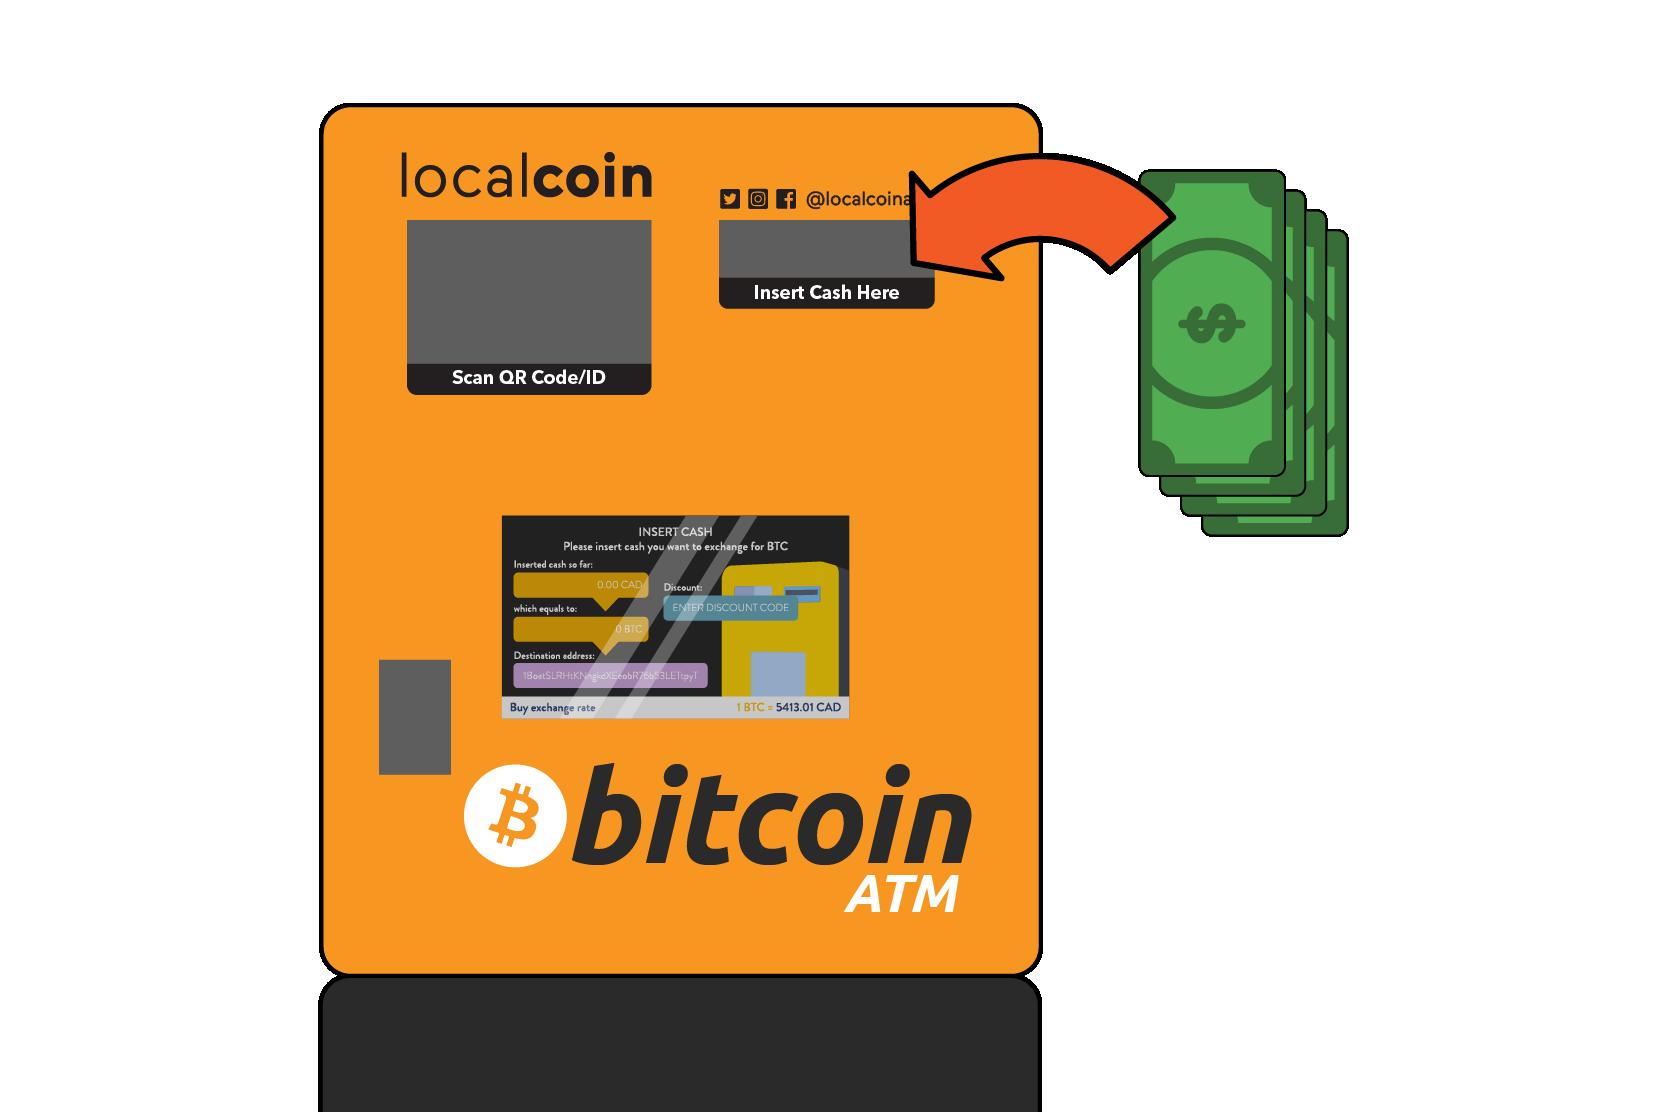 Purchasing Bitcoin at Bitcoin ATM